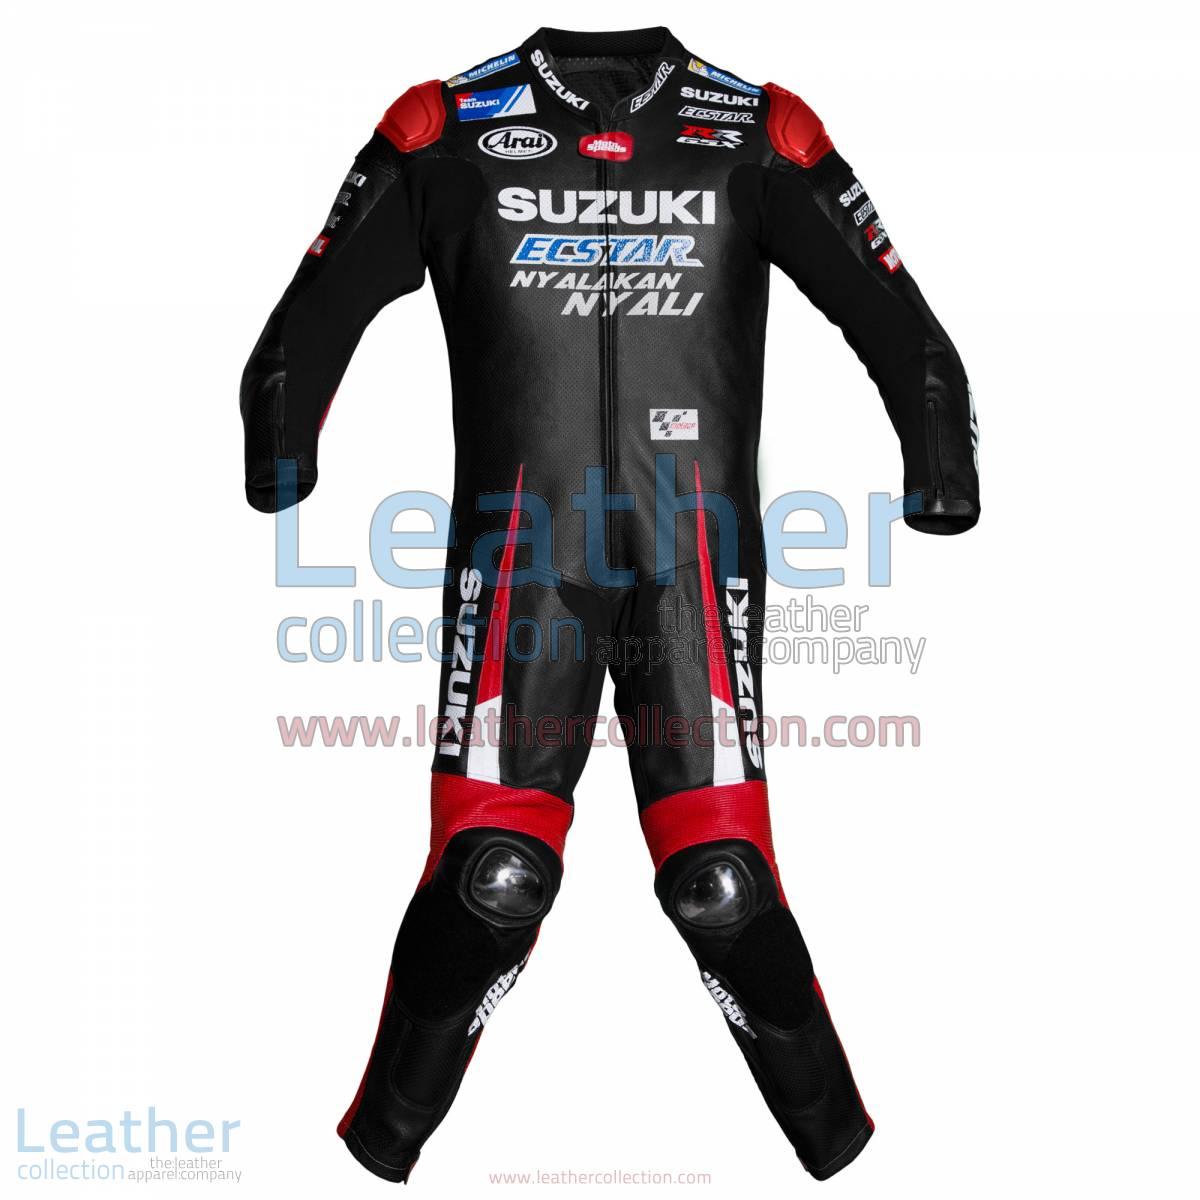 Maverick Vinales Suzuki MotoGP 2016 Leather Suit   Maverick Vinales Suzuki MotoGP 2016 Leather Suit